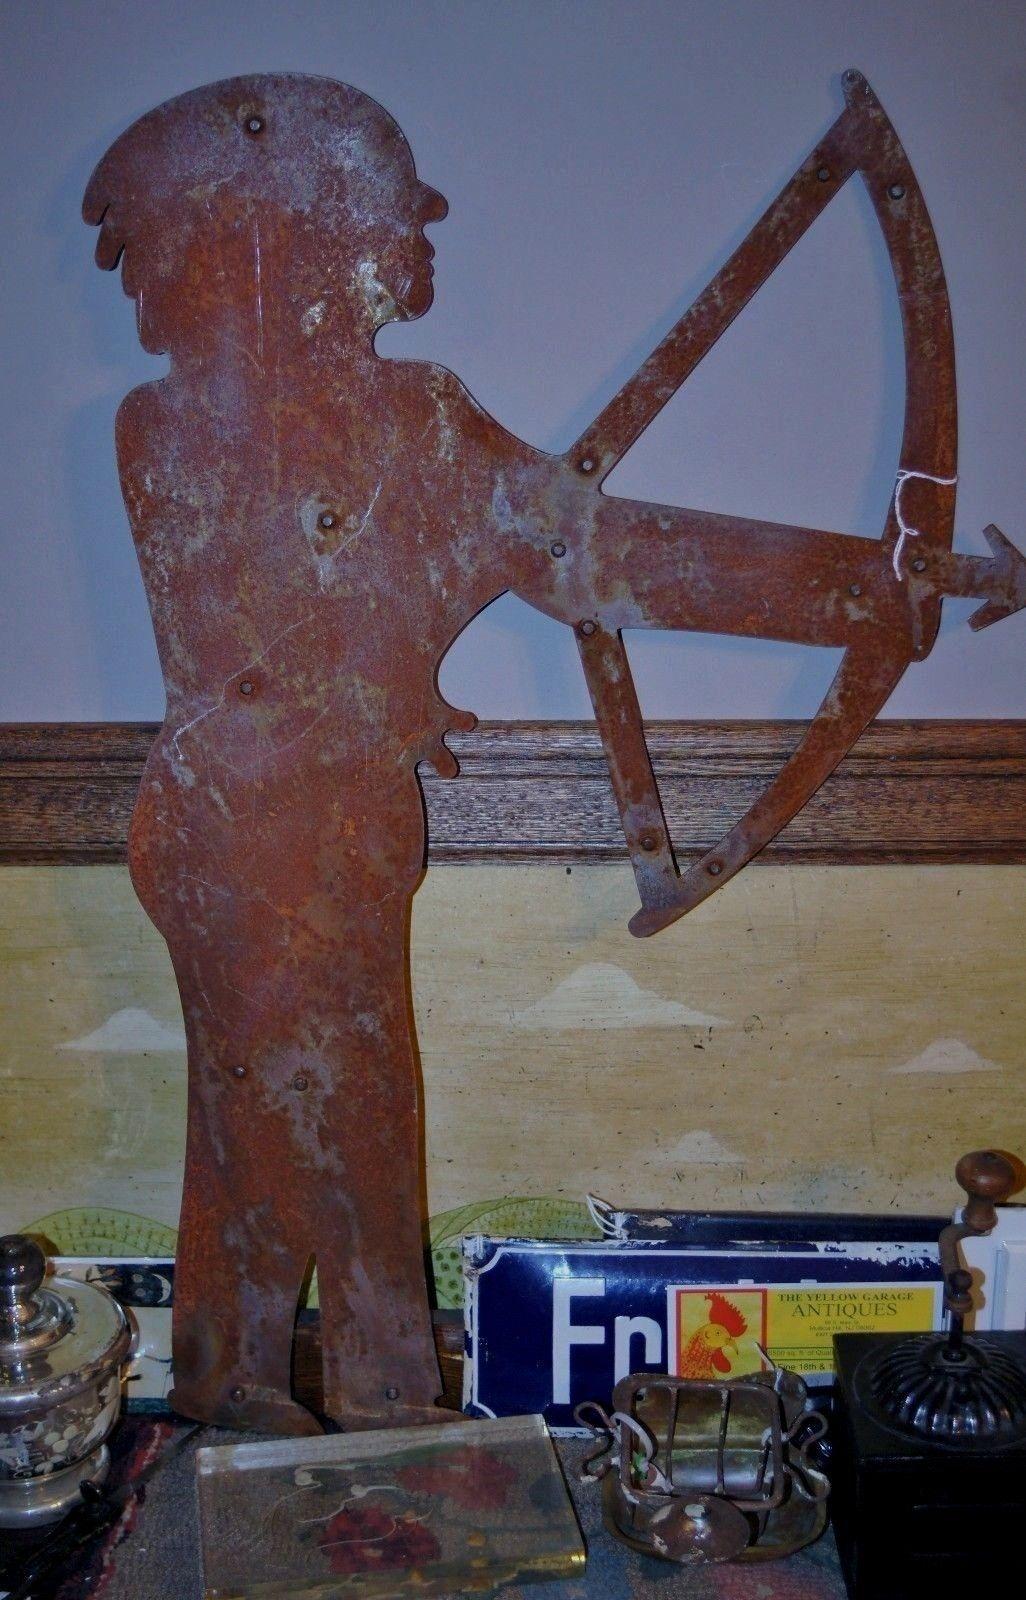 Antique sheet iron weather vane native american w bow u arrow